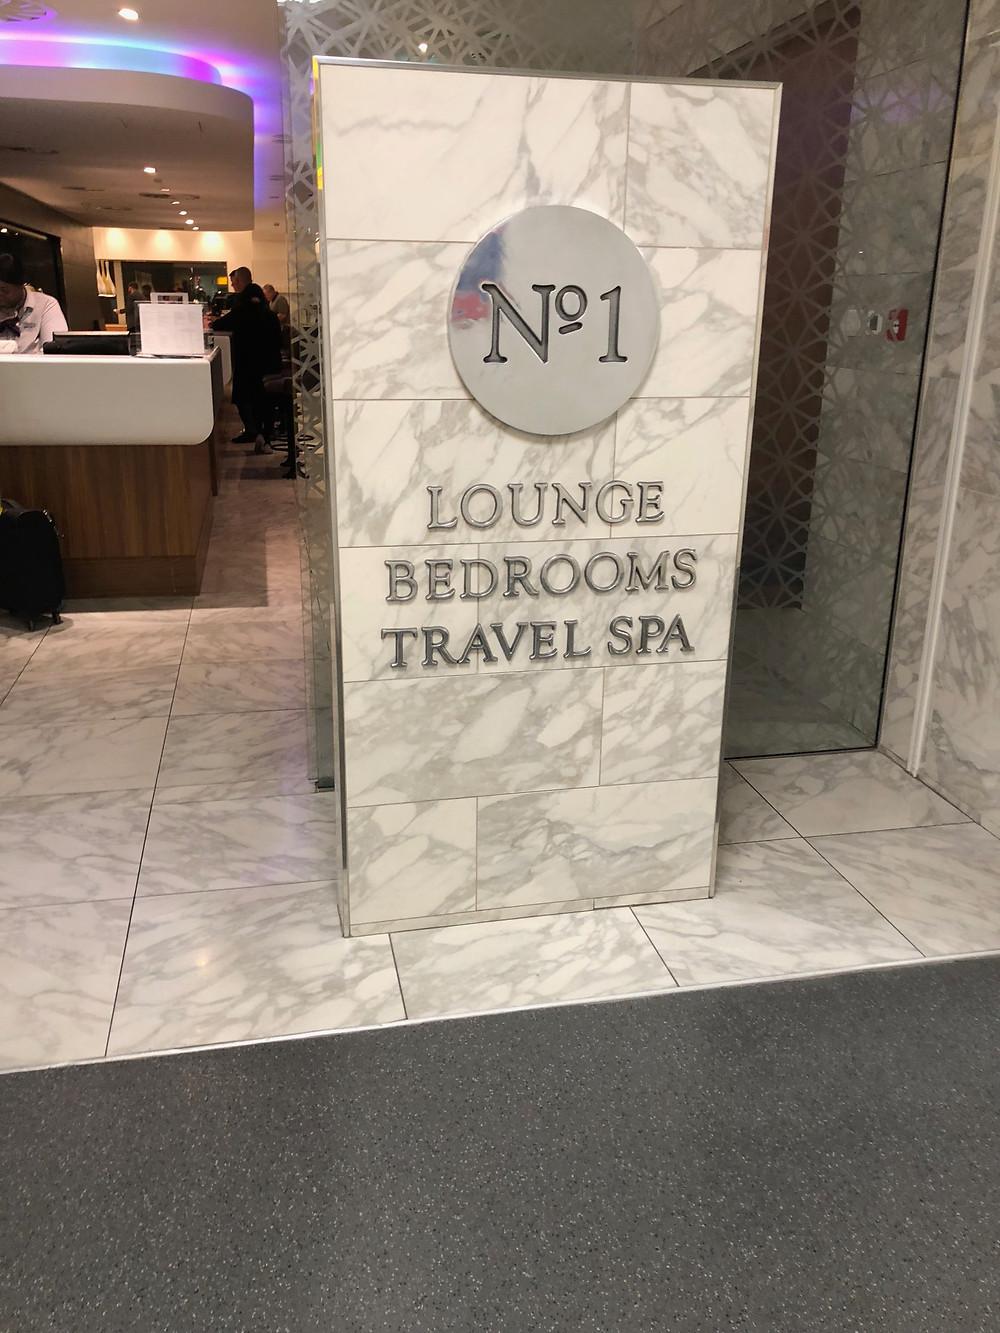 NO1 lounge Heathrow airport